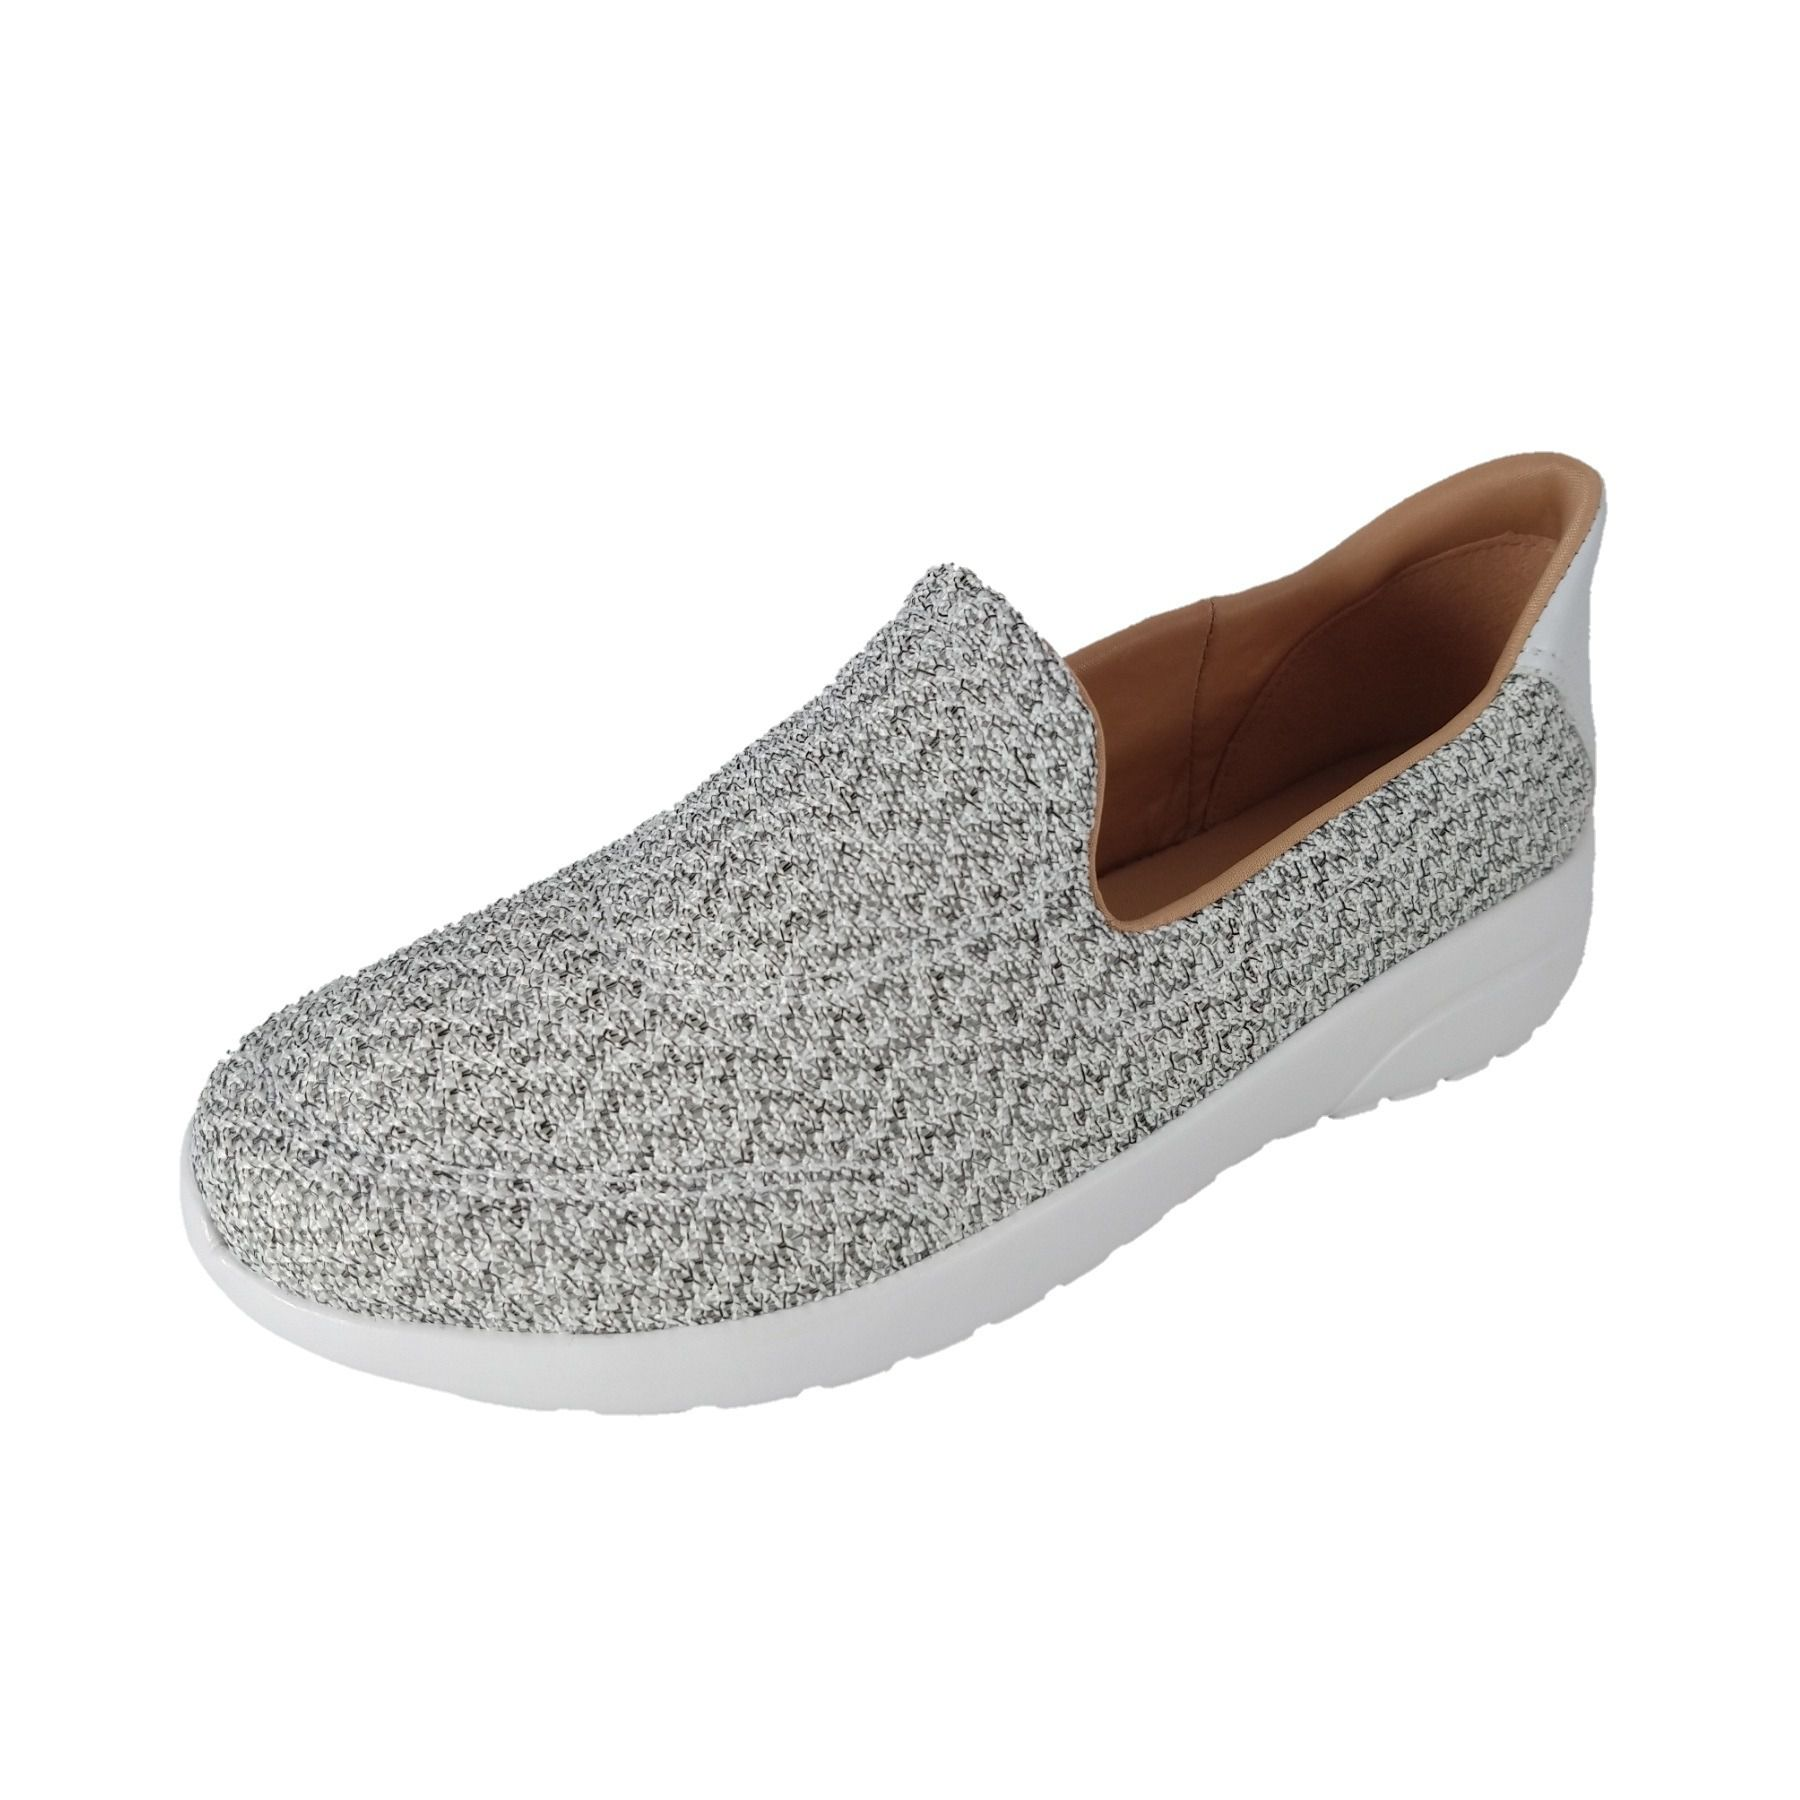 Tênis Confort Ramarim Sli On Knit Cinza  - SAPATOWEB.COM